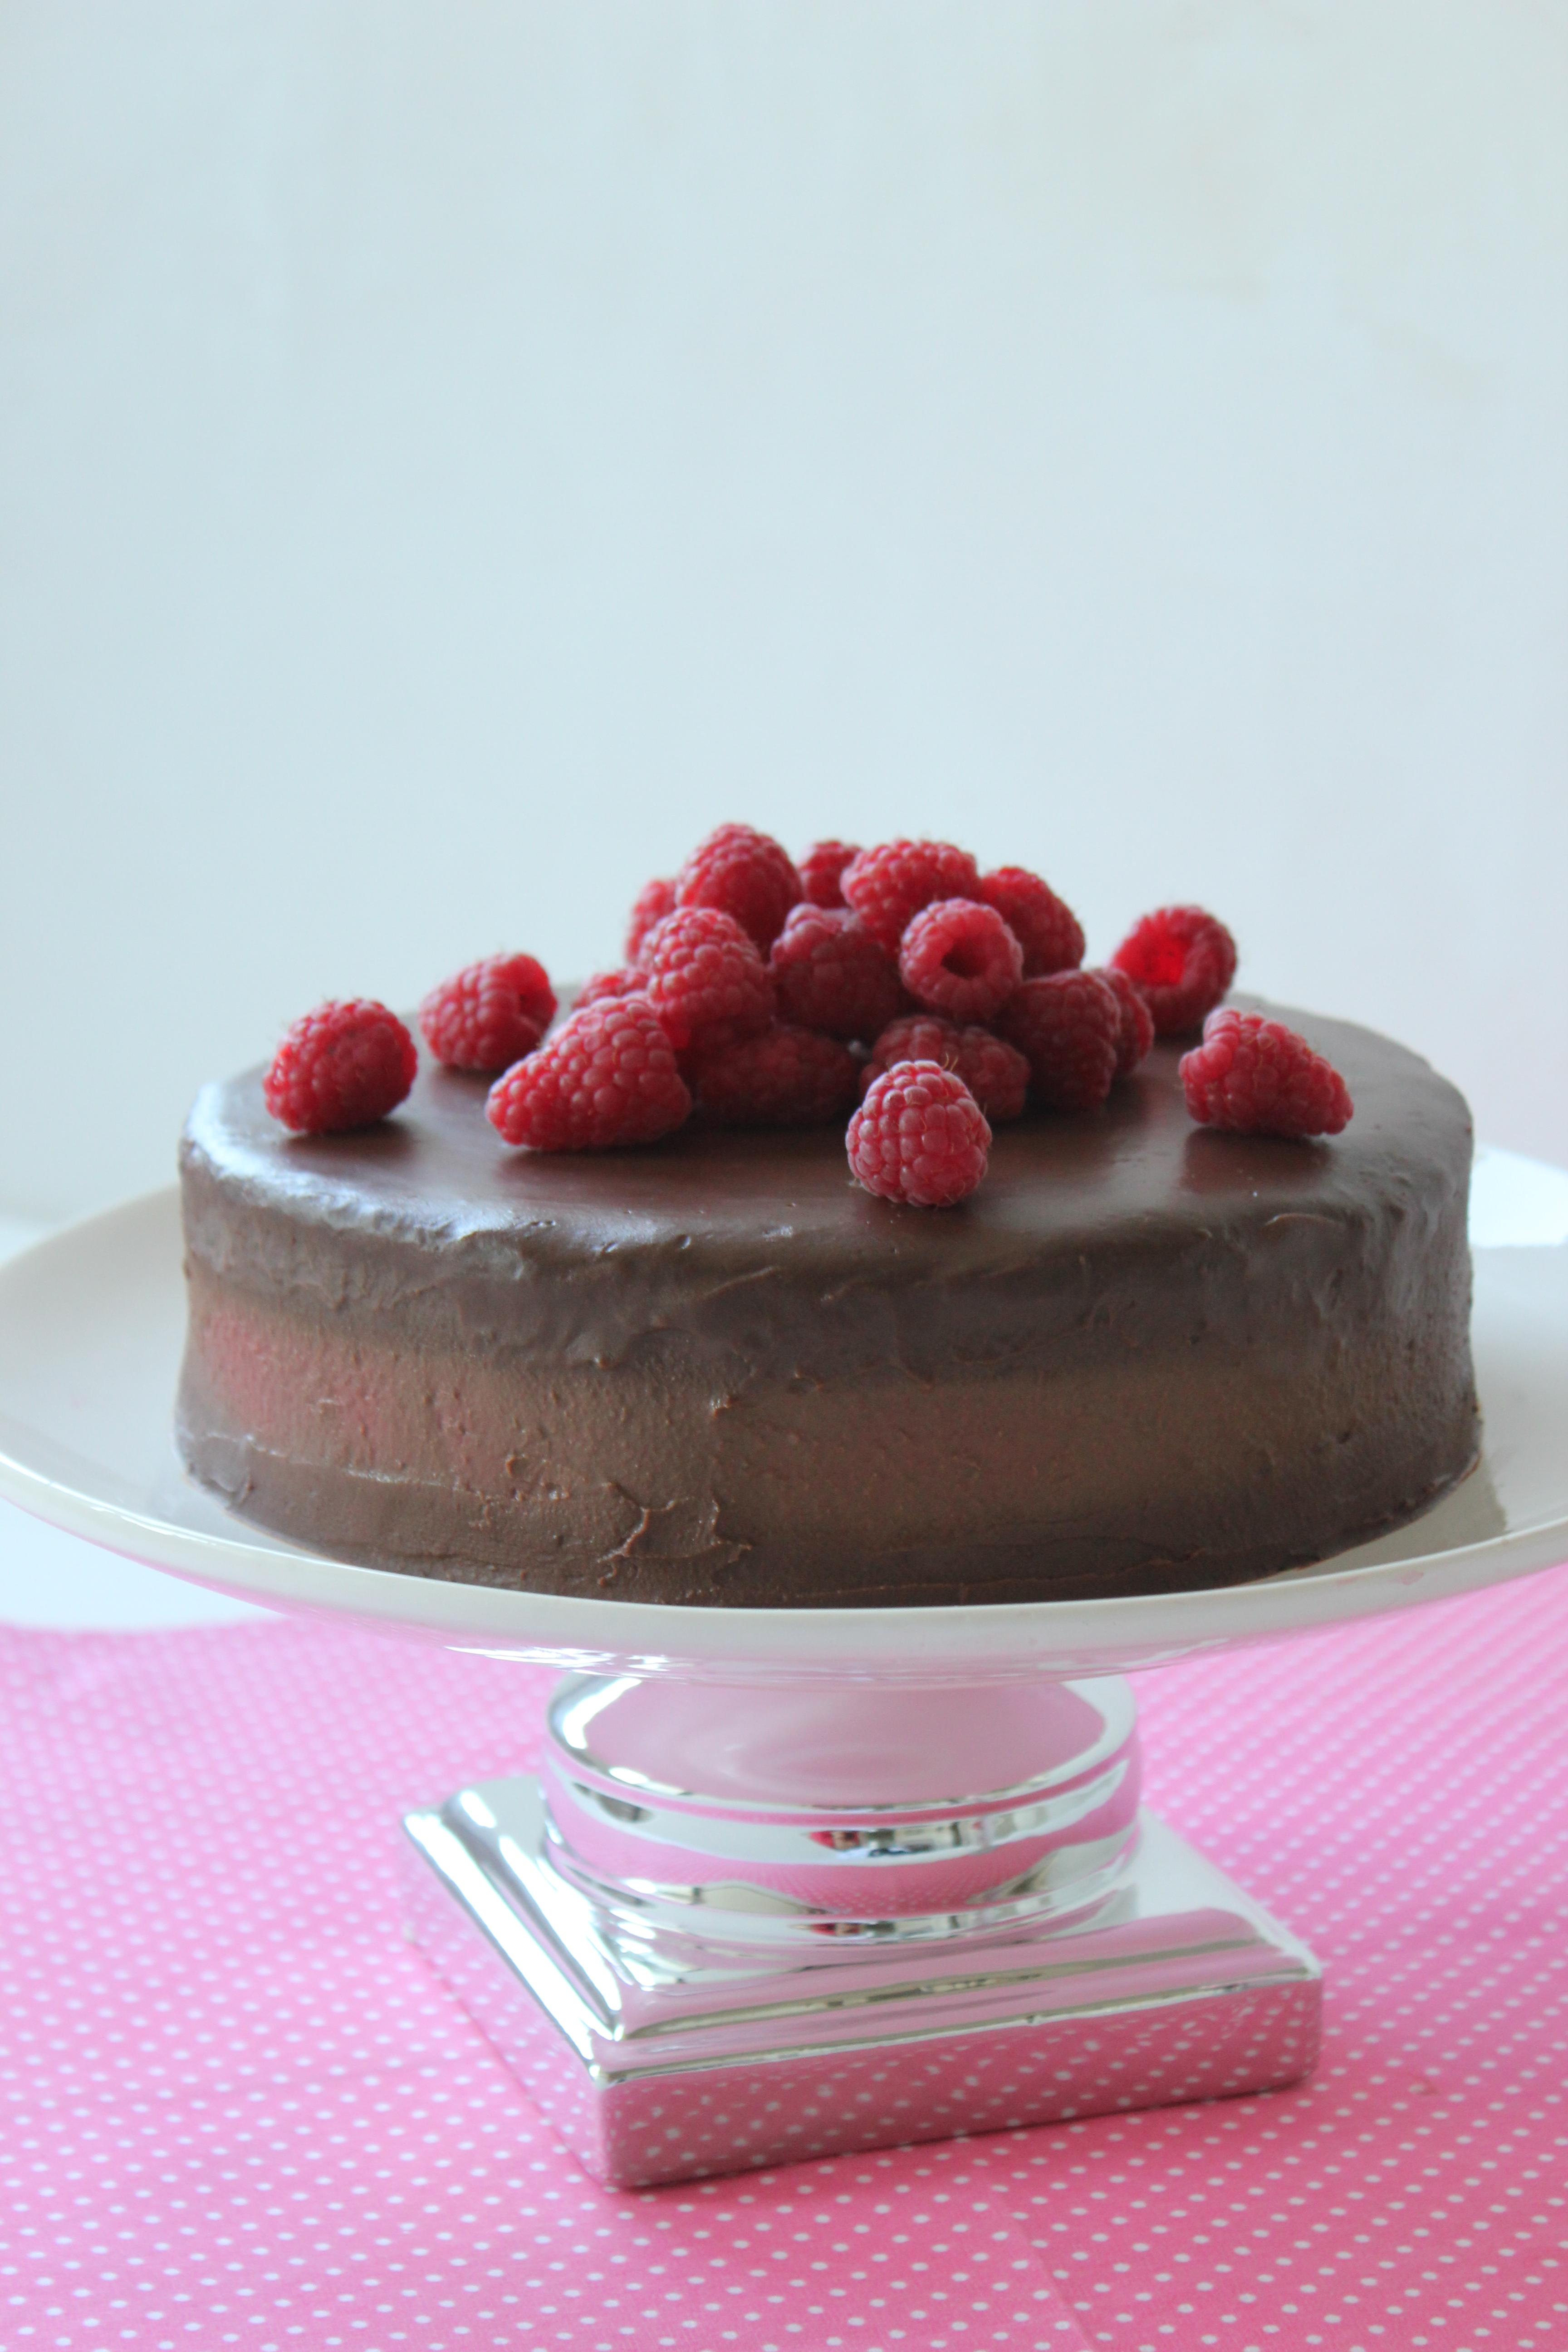 Schokoladen Himbeermousse Traum Disaster Tezukuri Baking